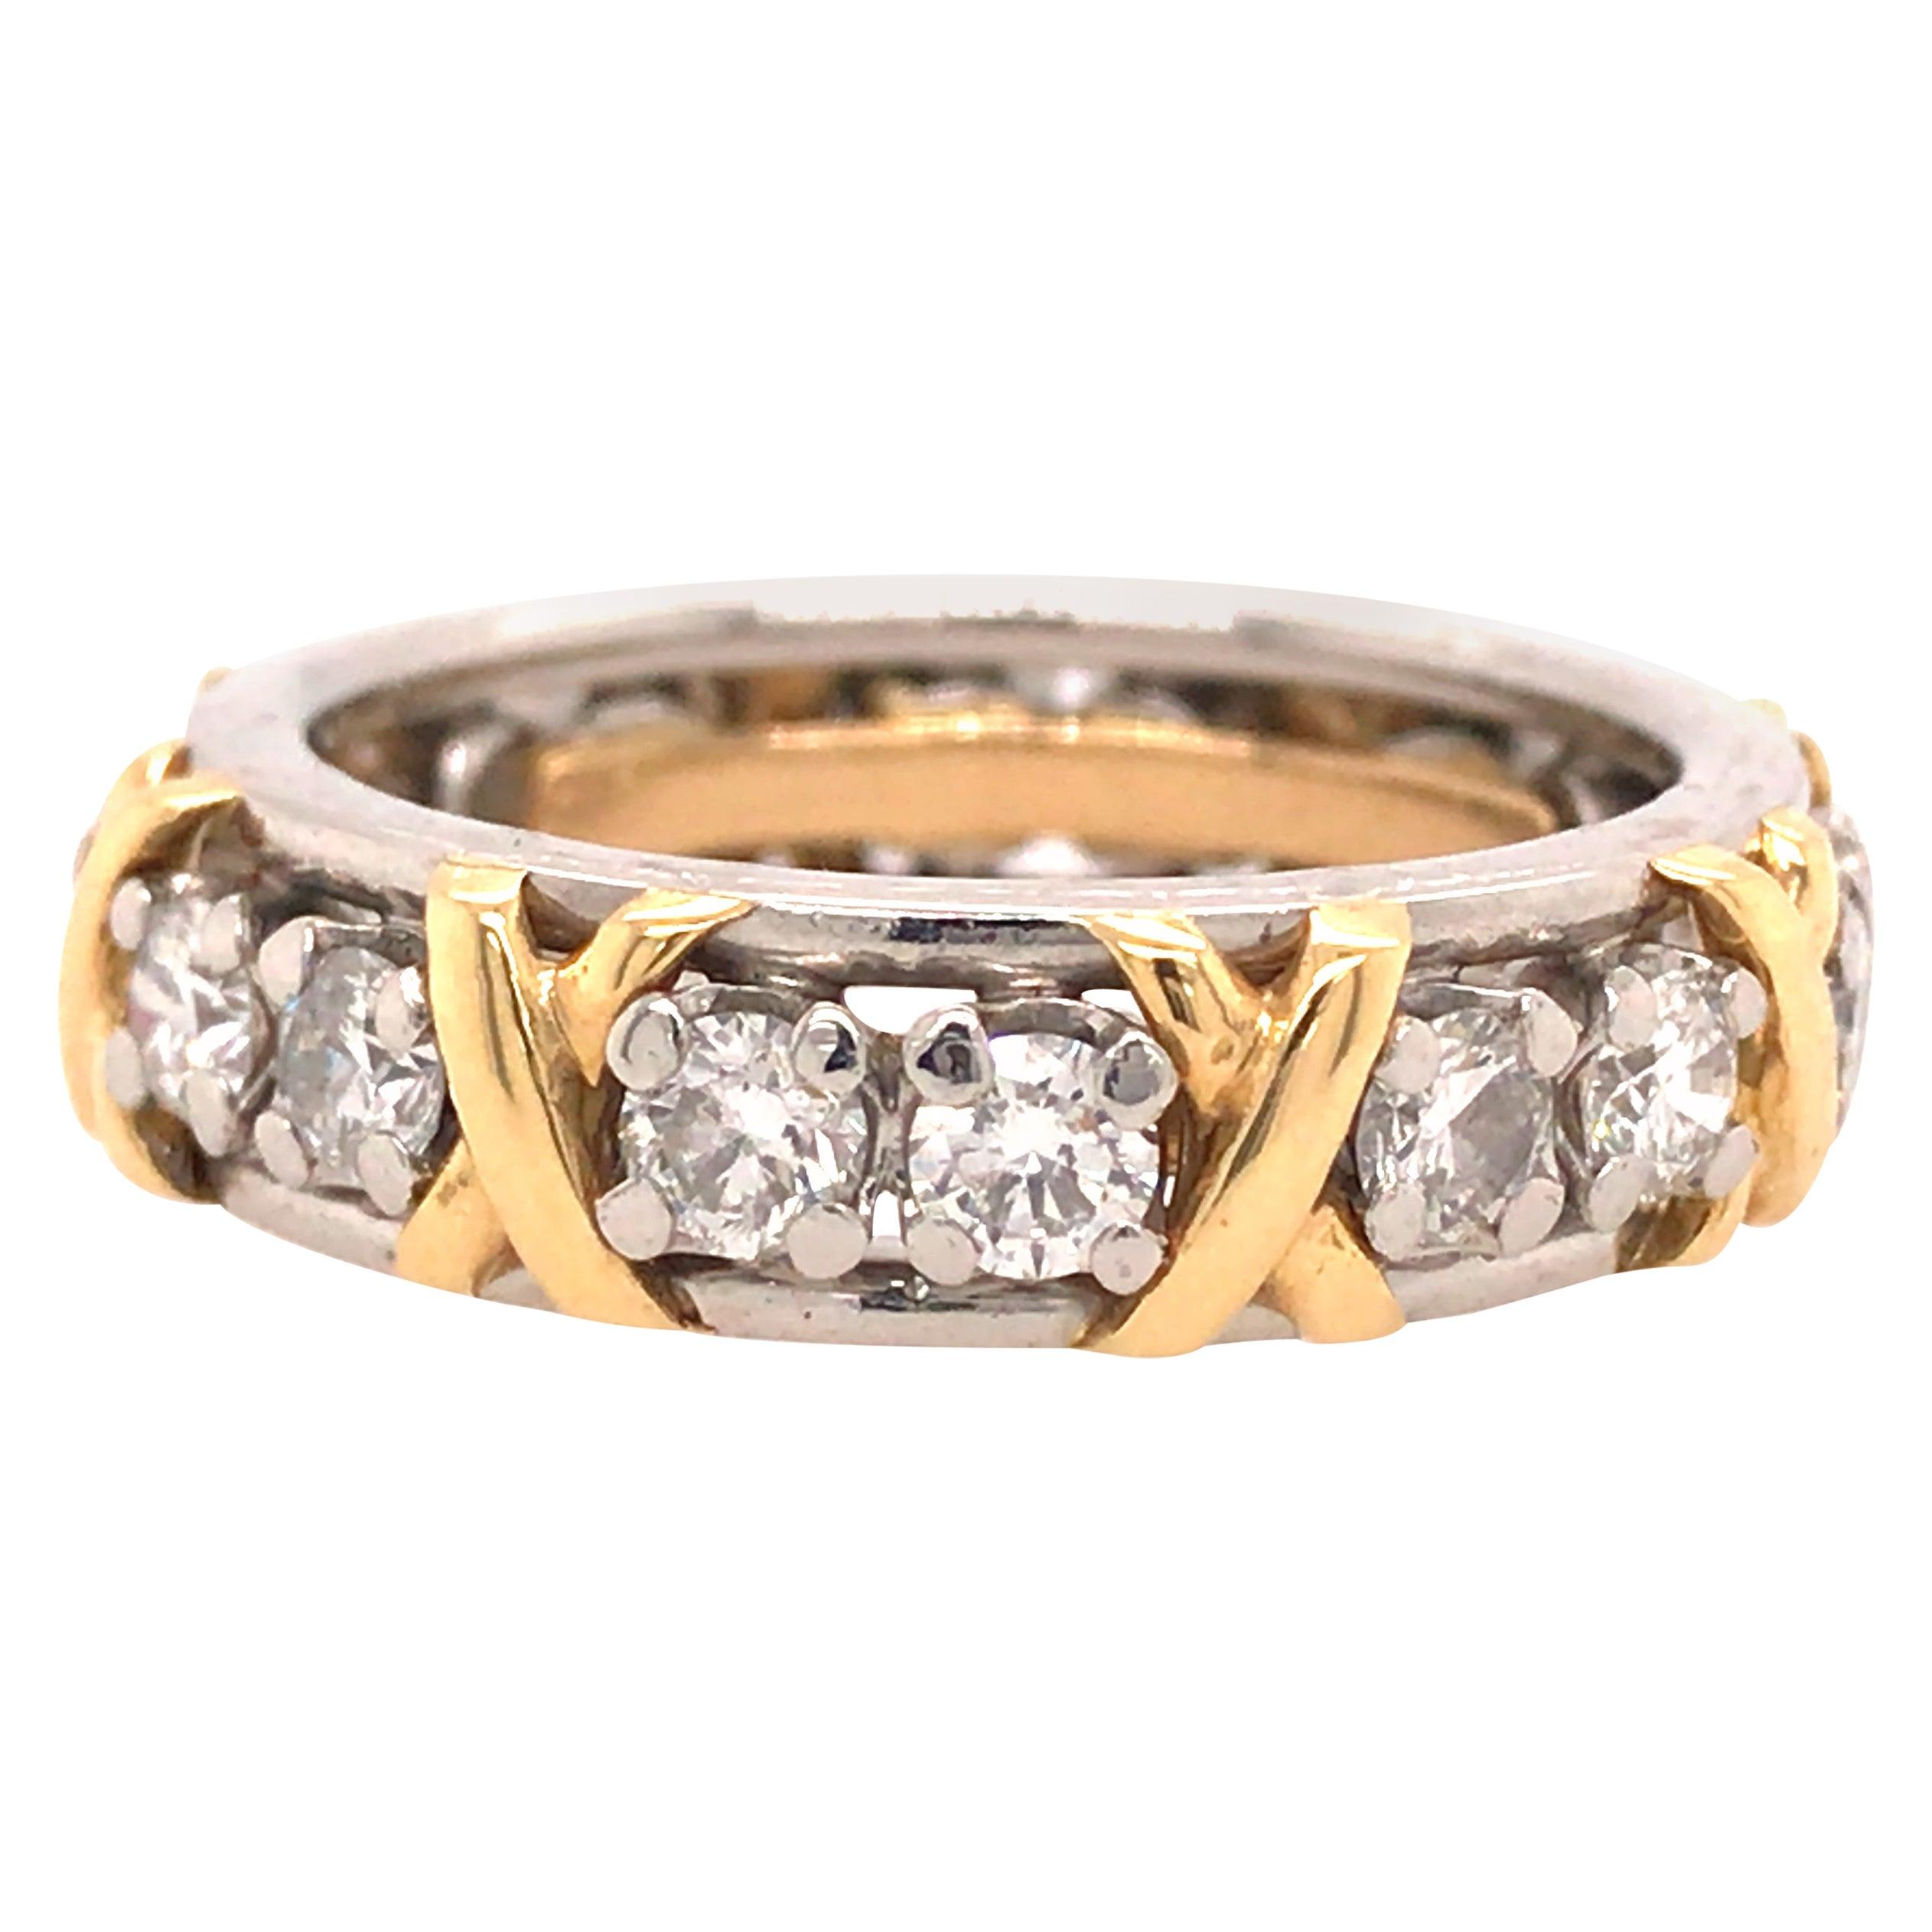 Tiffany & Co. Schlumberger 16 Diamond Eternity Band in 18K Yellow Gold Platinum